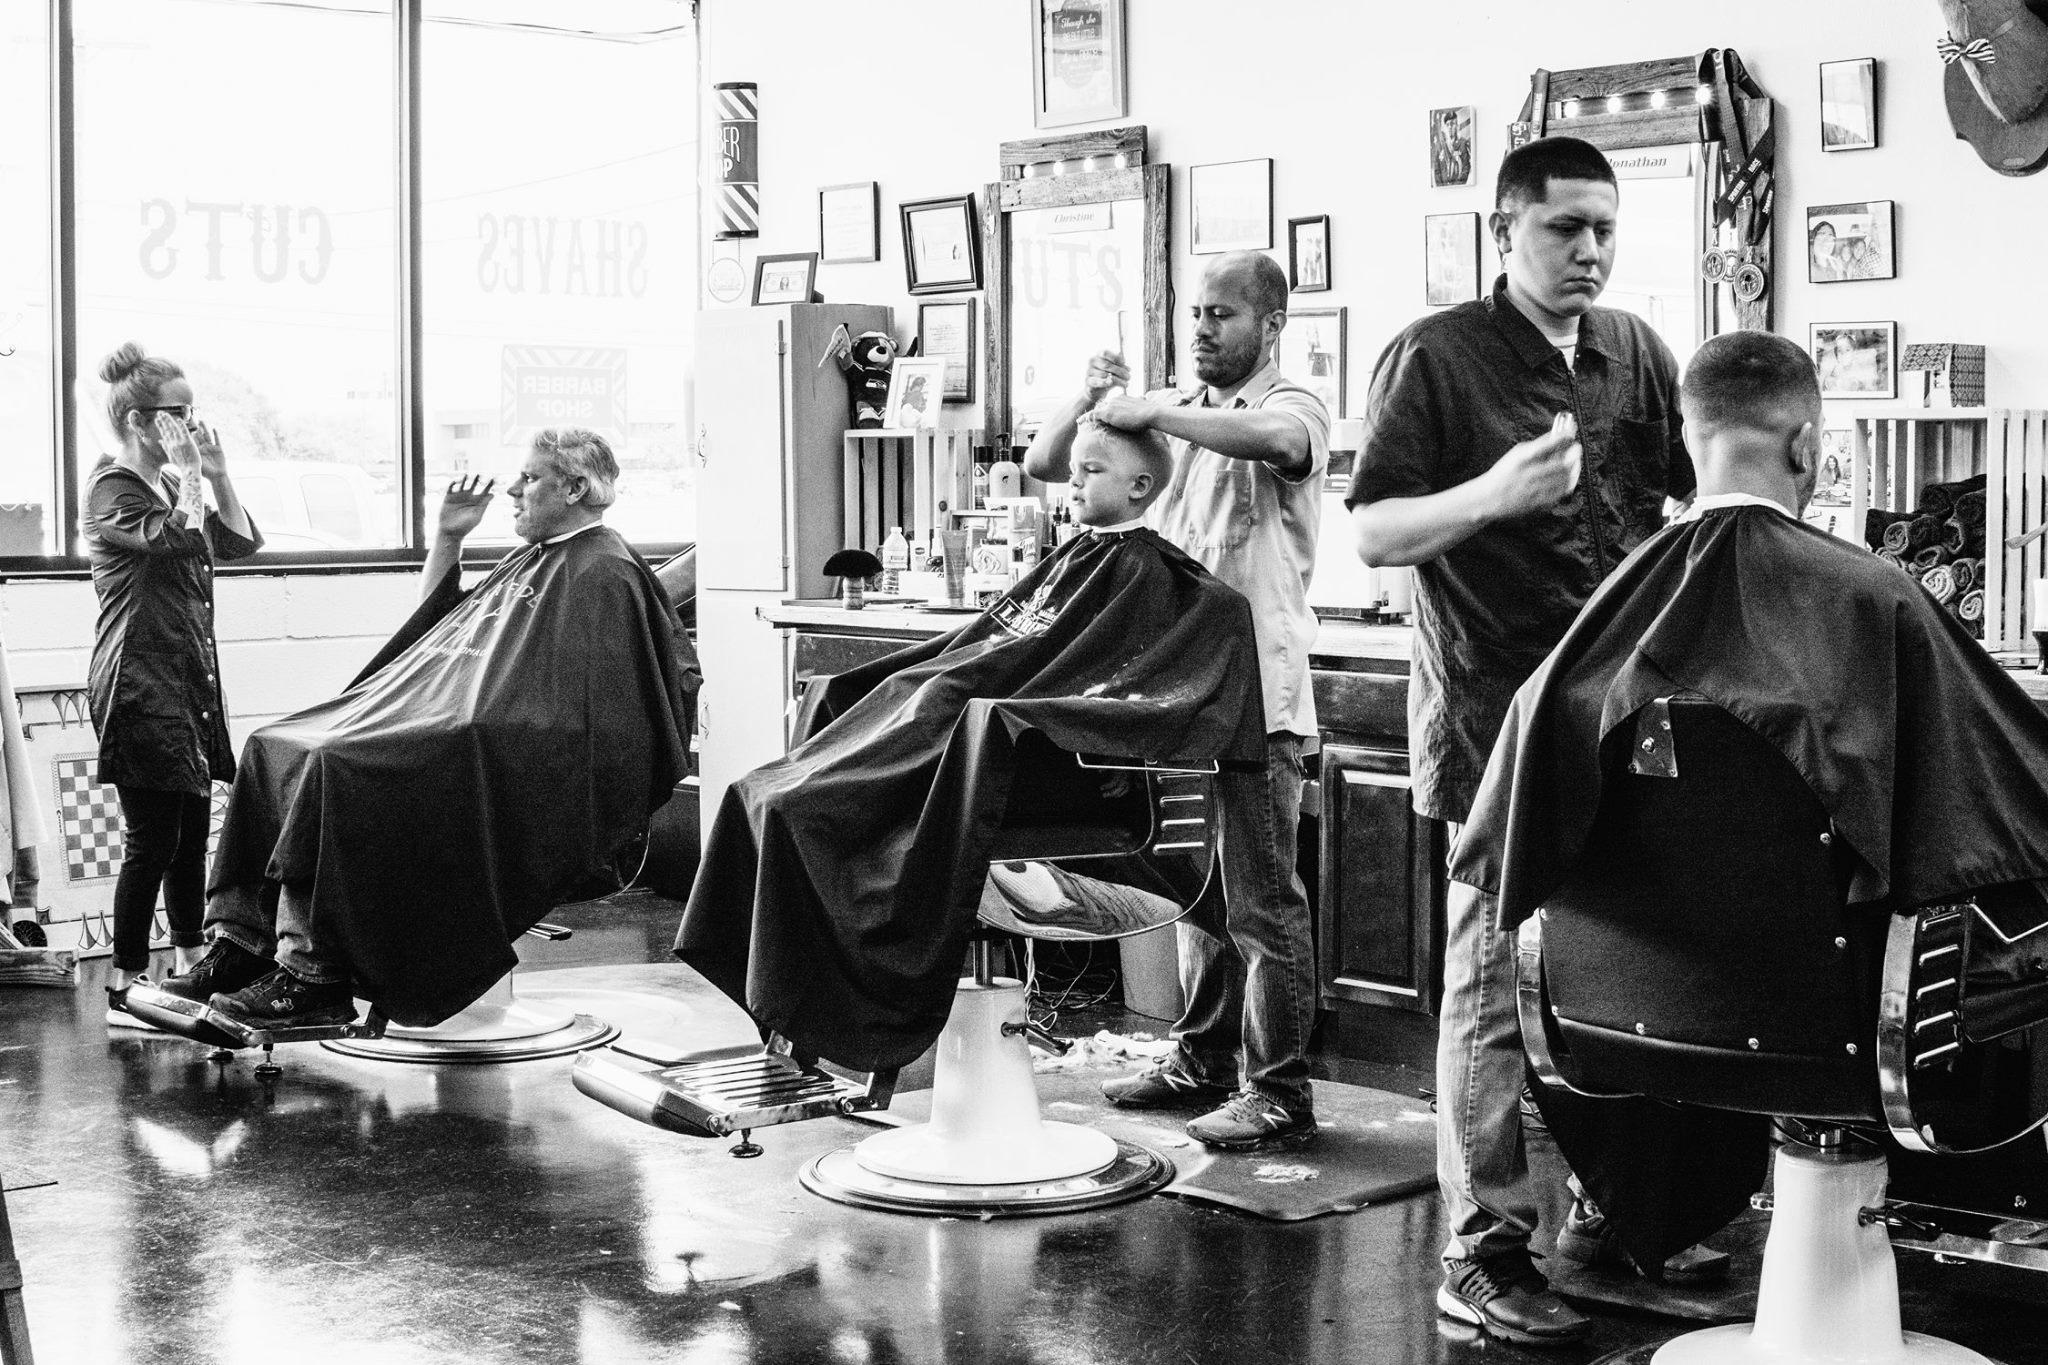 Robertson's Classic Barber Shop